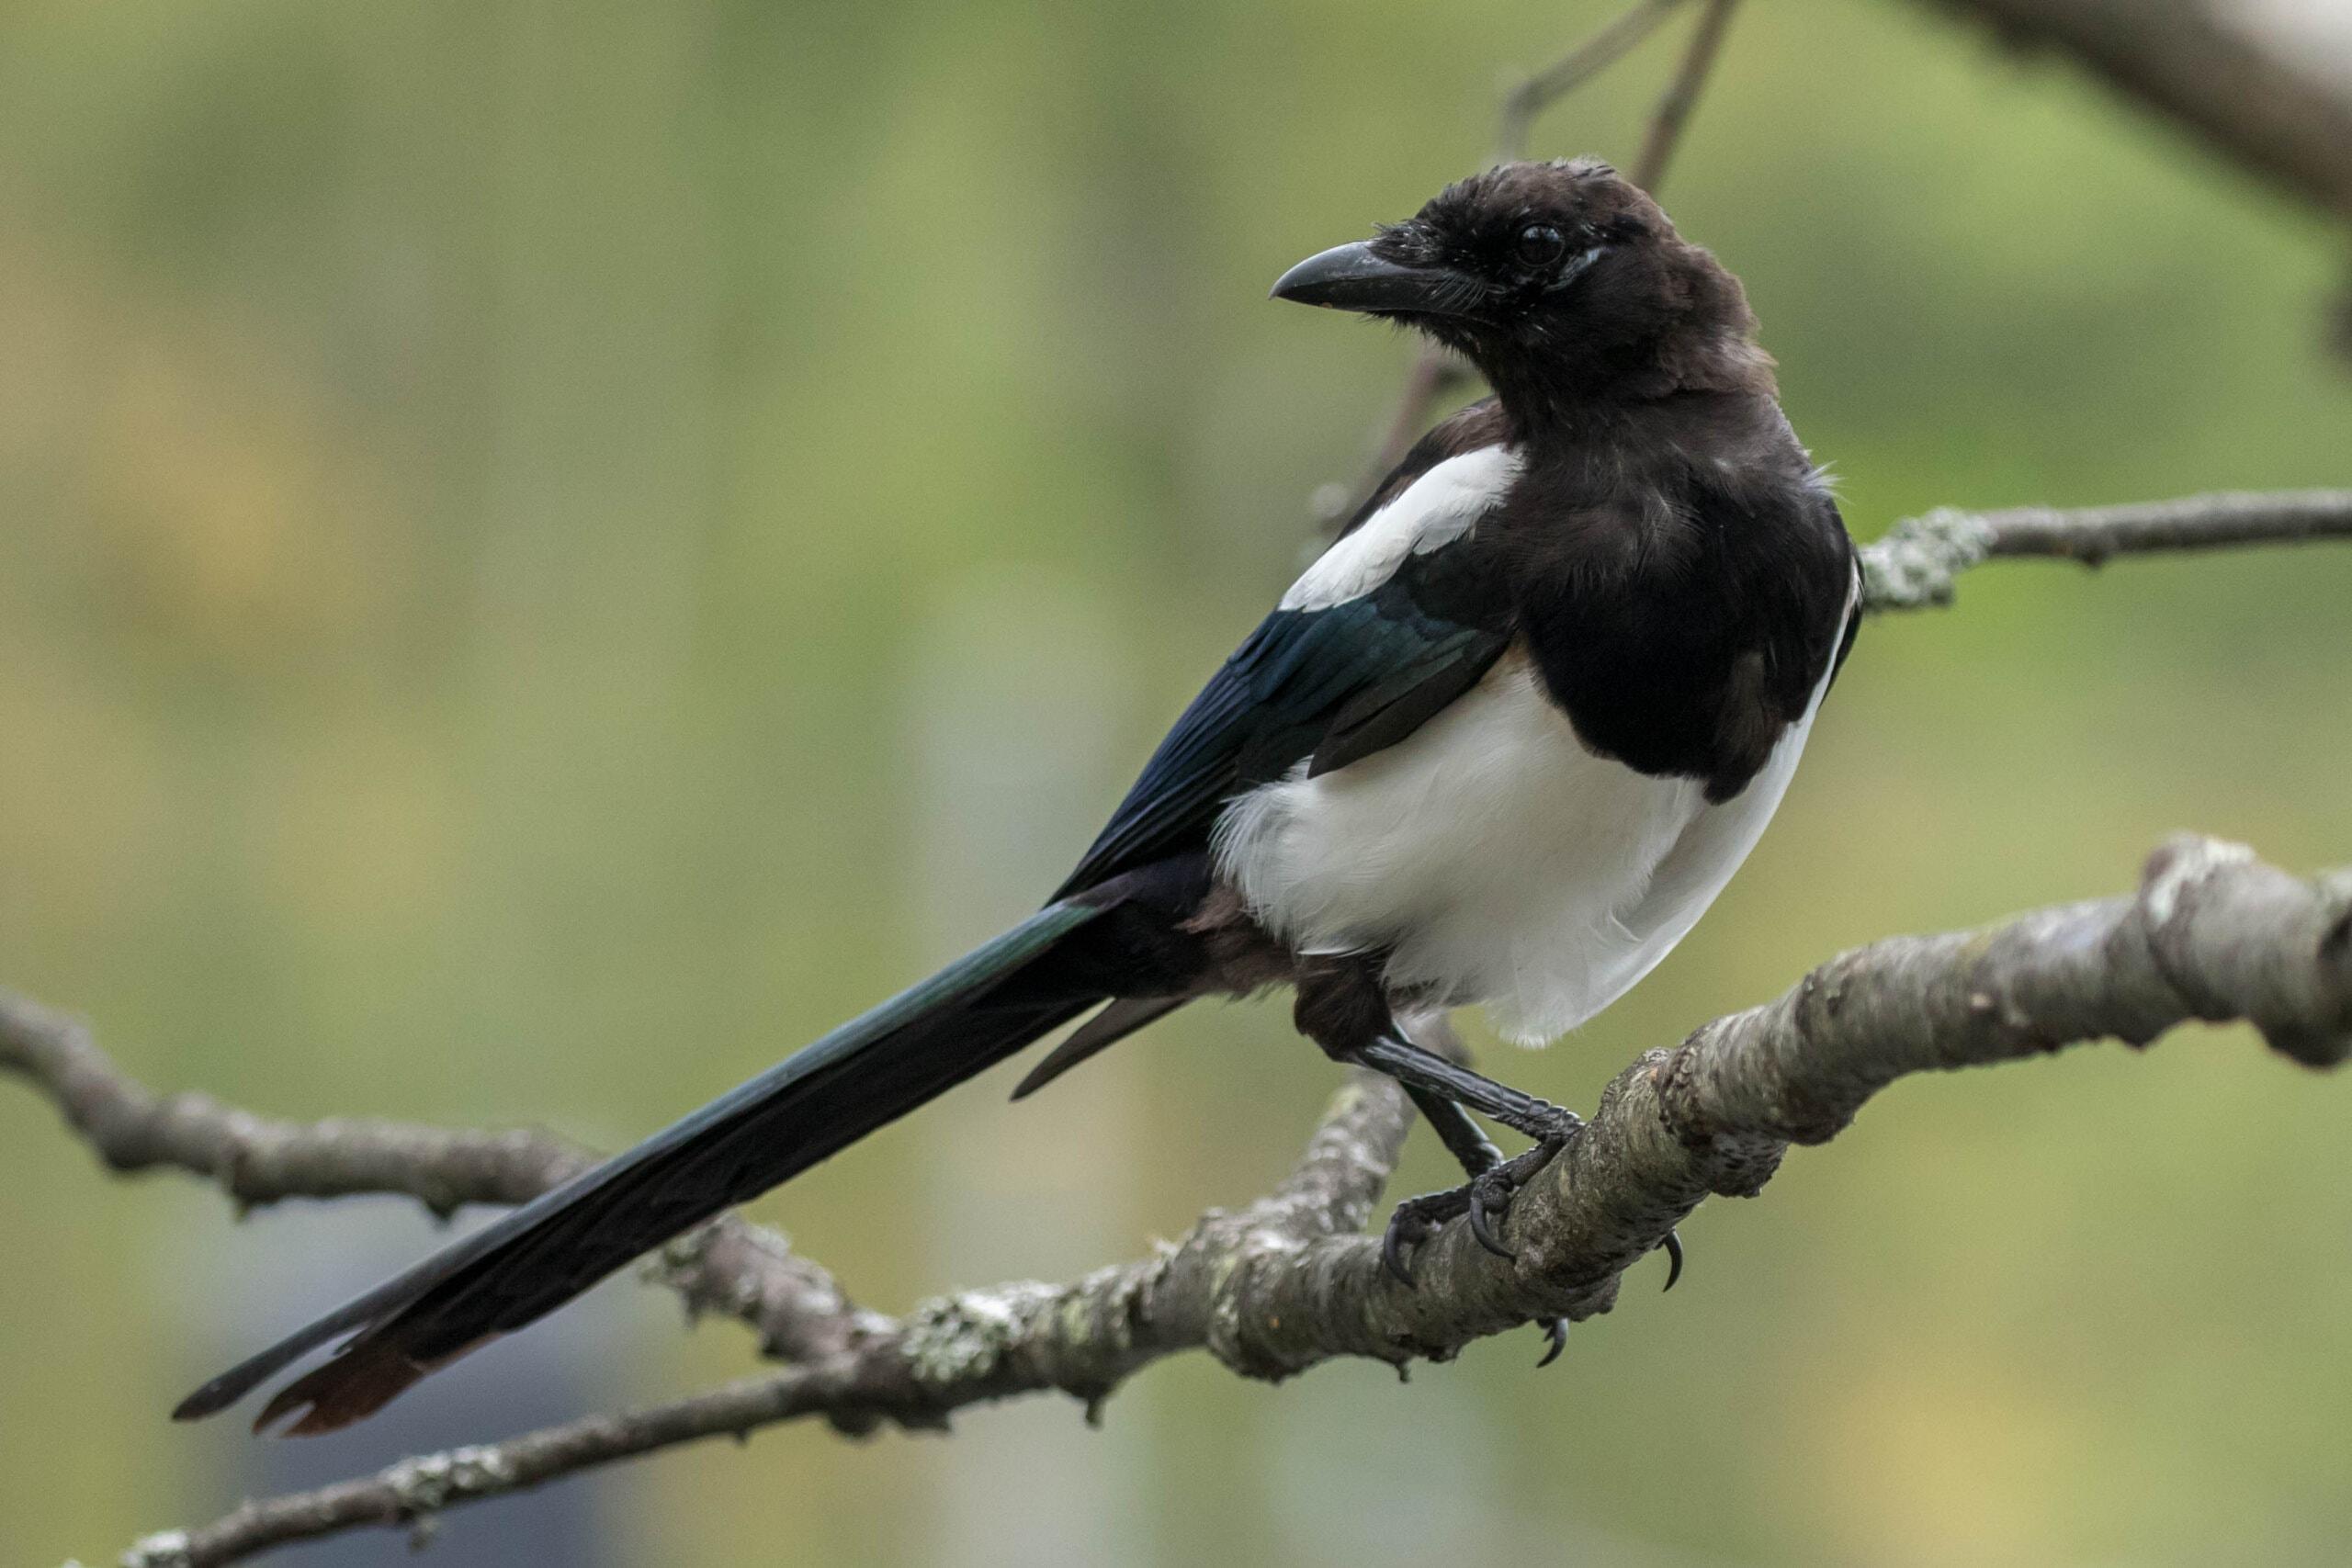 Eurasian Magpie @ Nittedal, Norway. Photo: Håvard Rosenlund